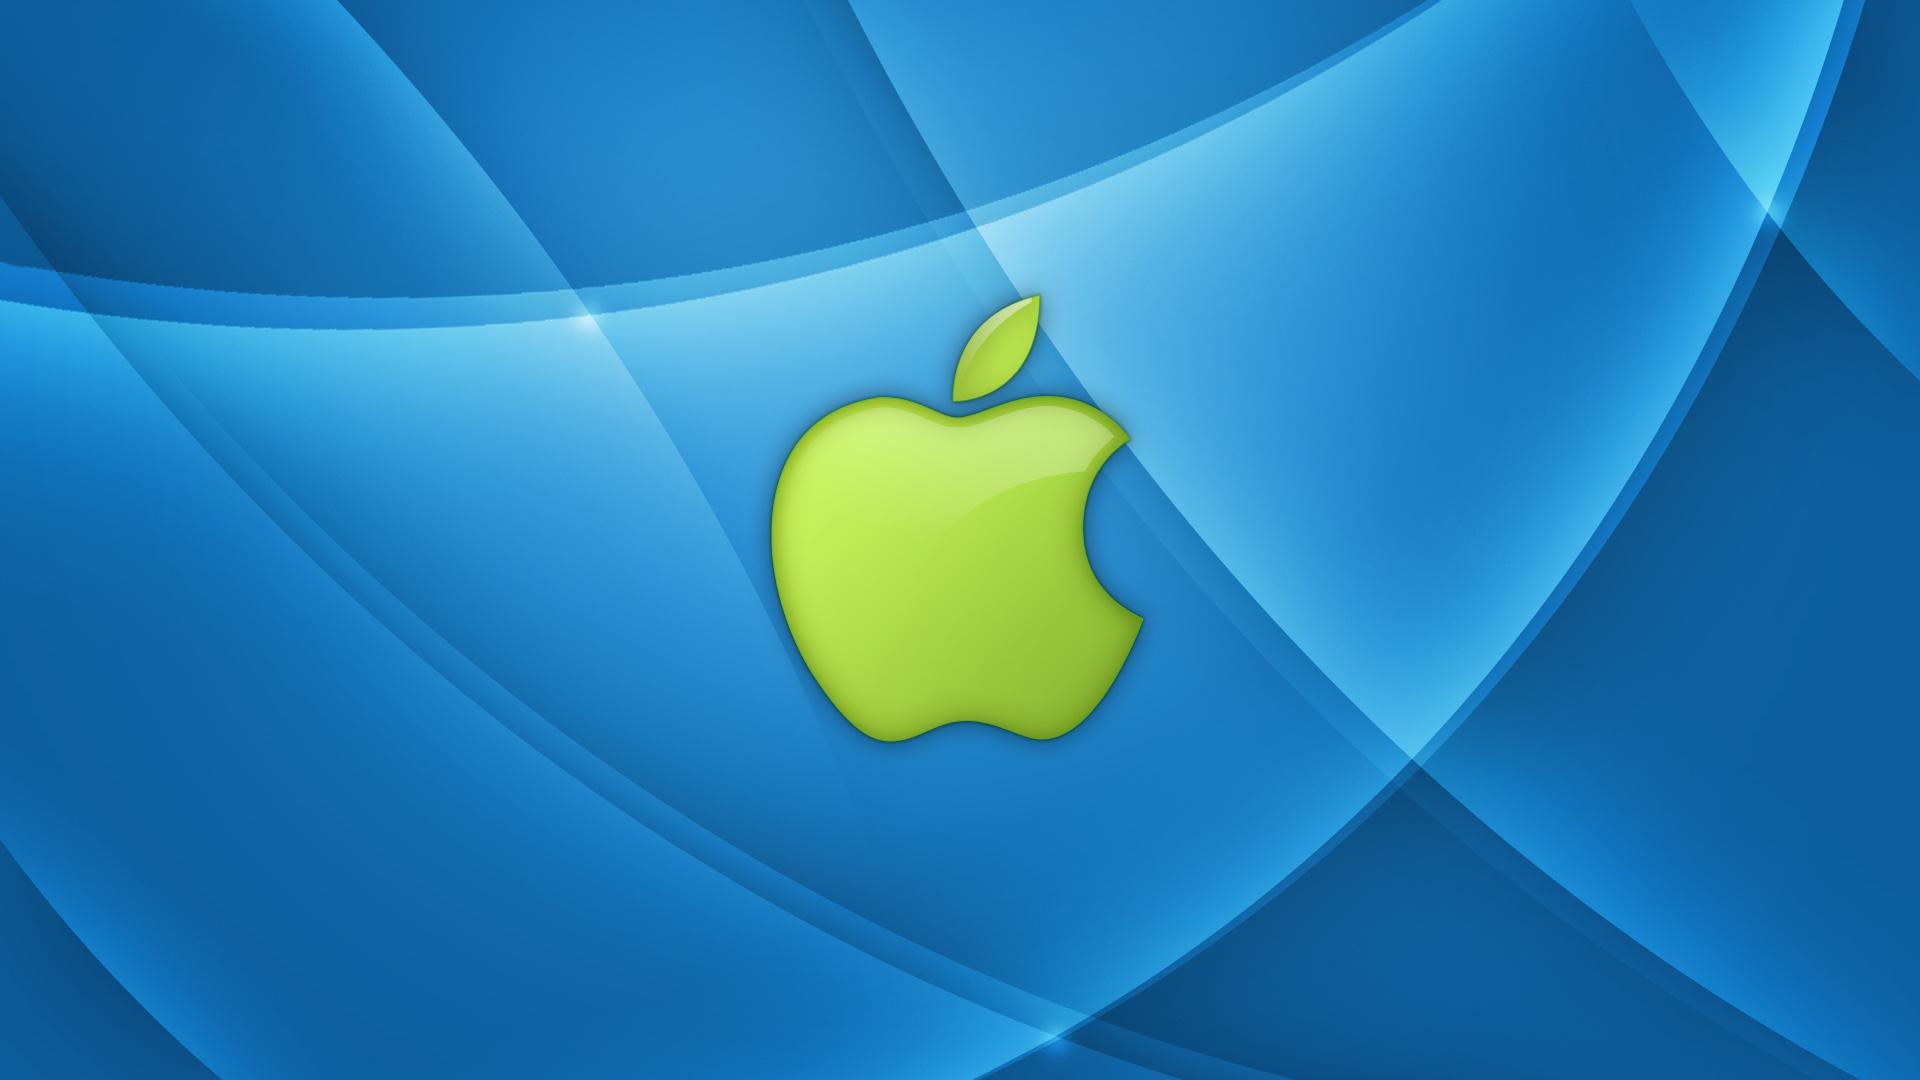 Best Wallpaper Mac Blue - app_store_apple_mac_blue_green_wave_8141_1920x1080  HD_303771.jpg